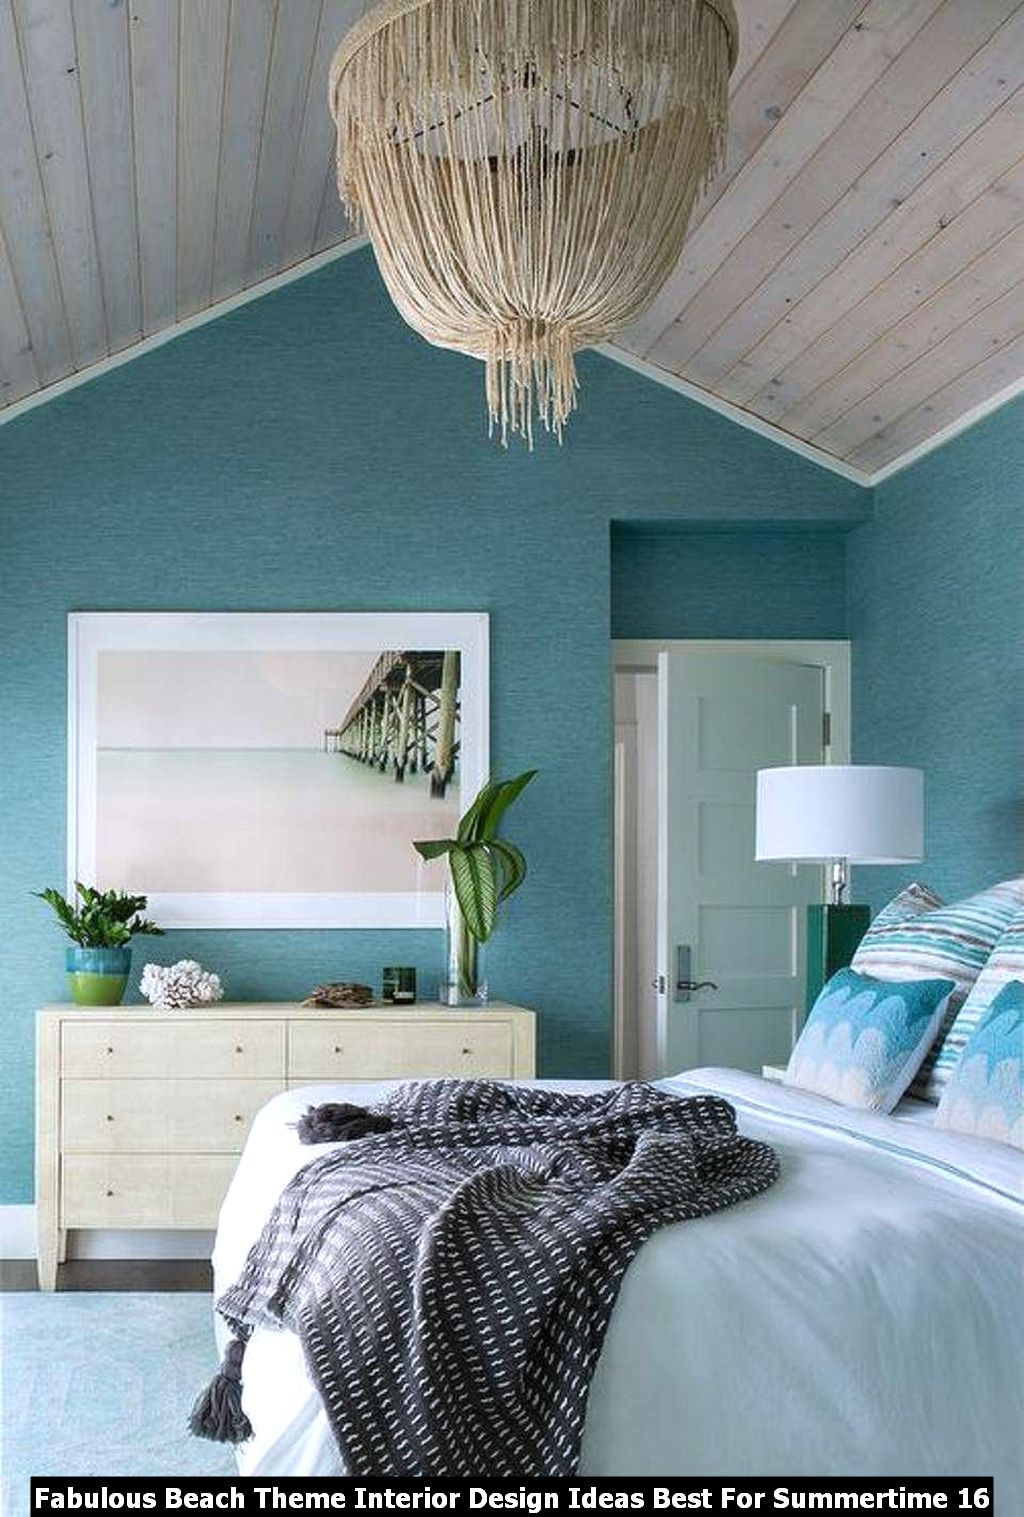 Fabulous Beach Theme Interior Design Ideas Best For Summertime 16